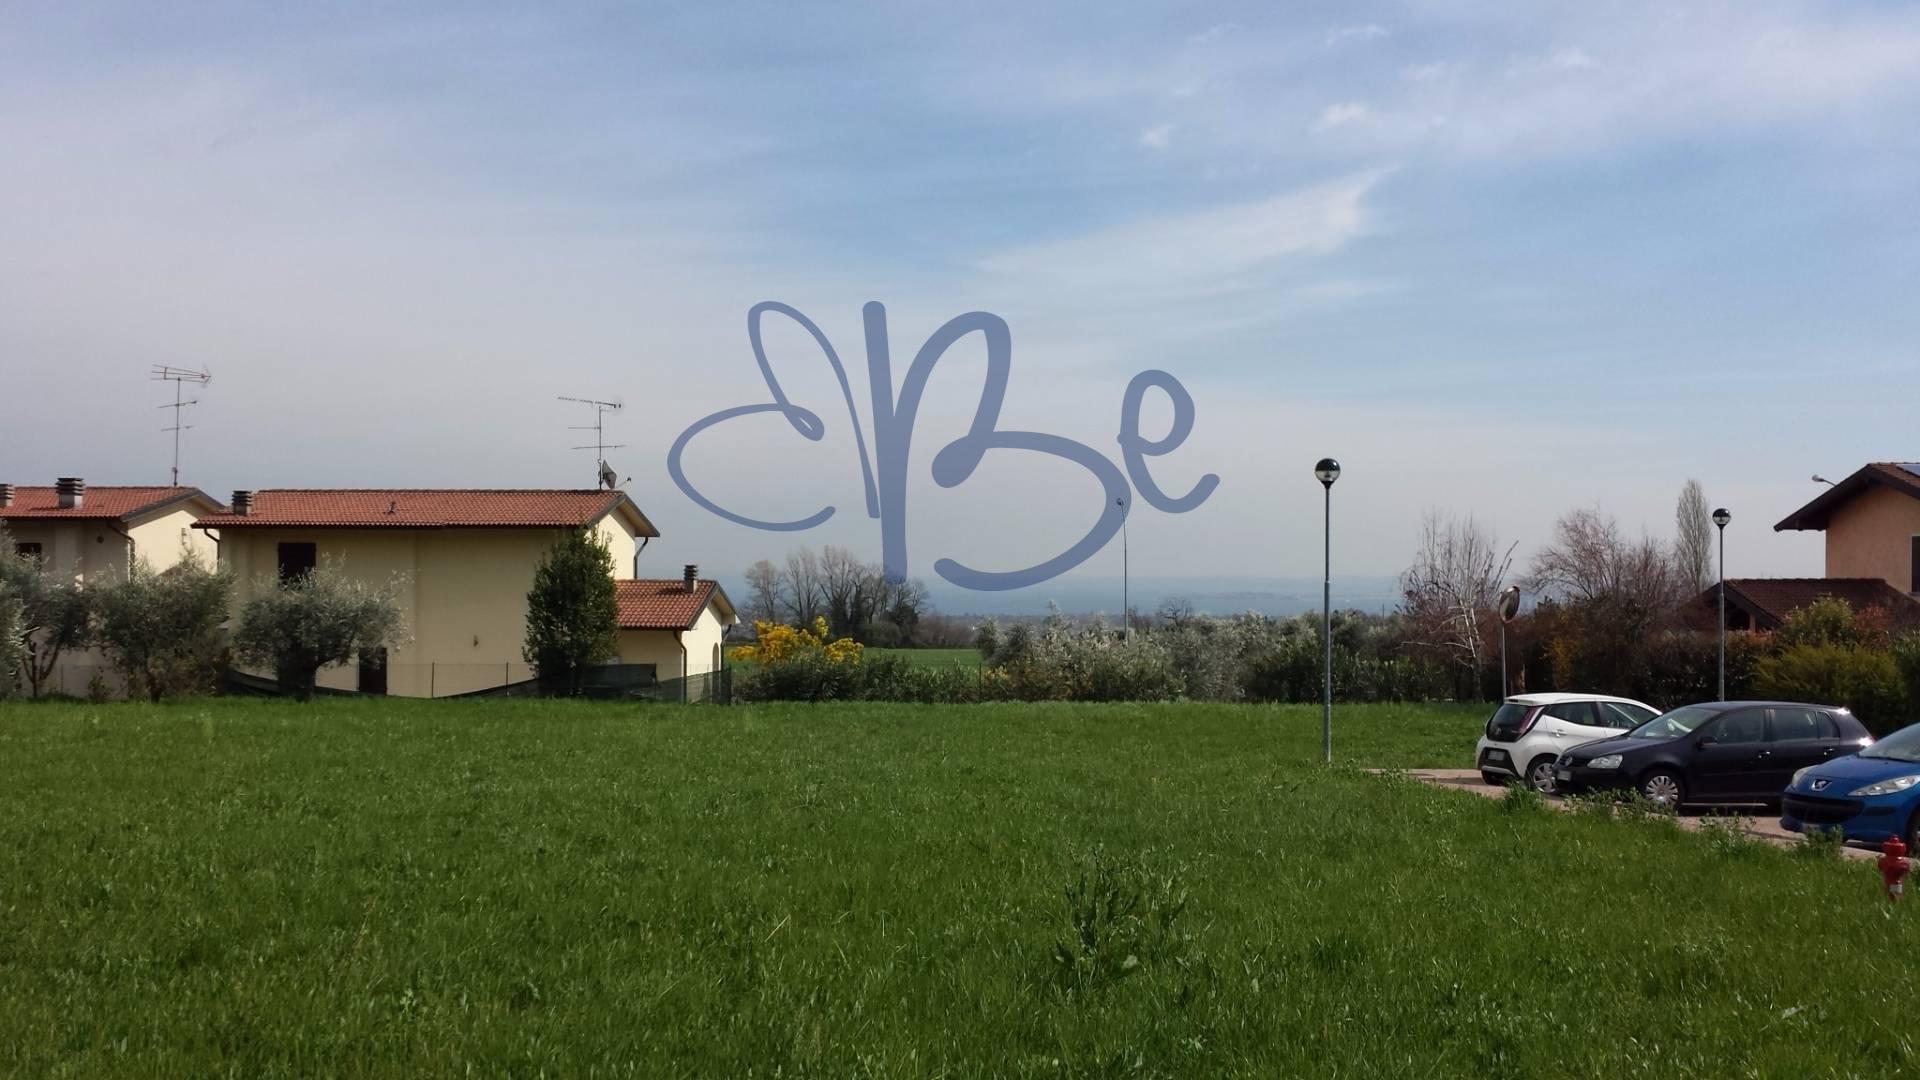 Bilocale Puegnago sul Garda Via Predefitte 5